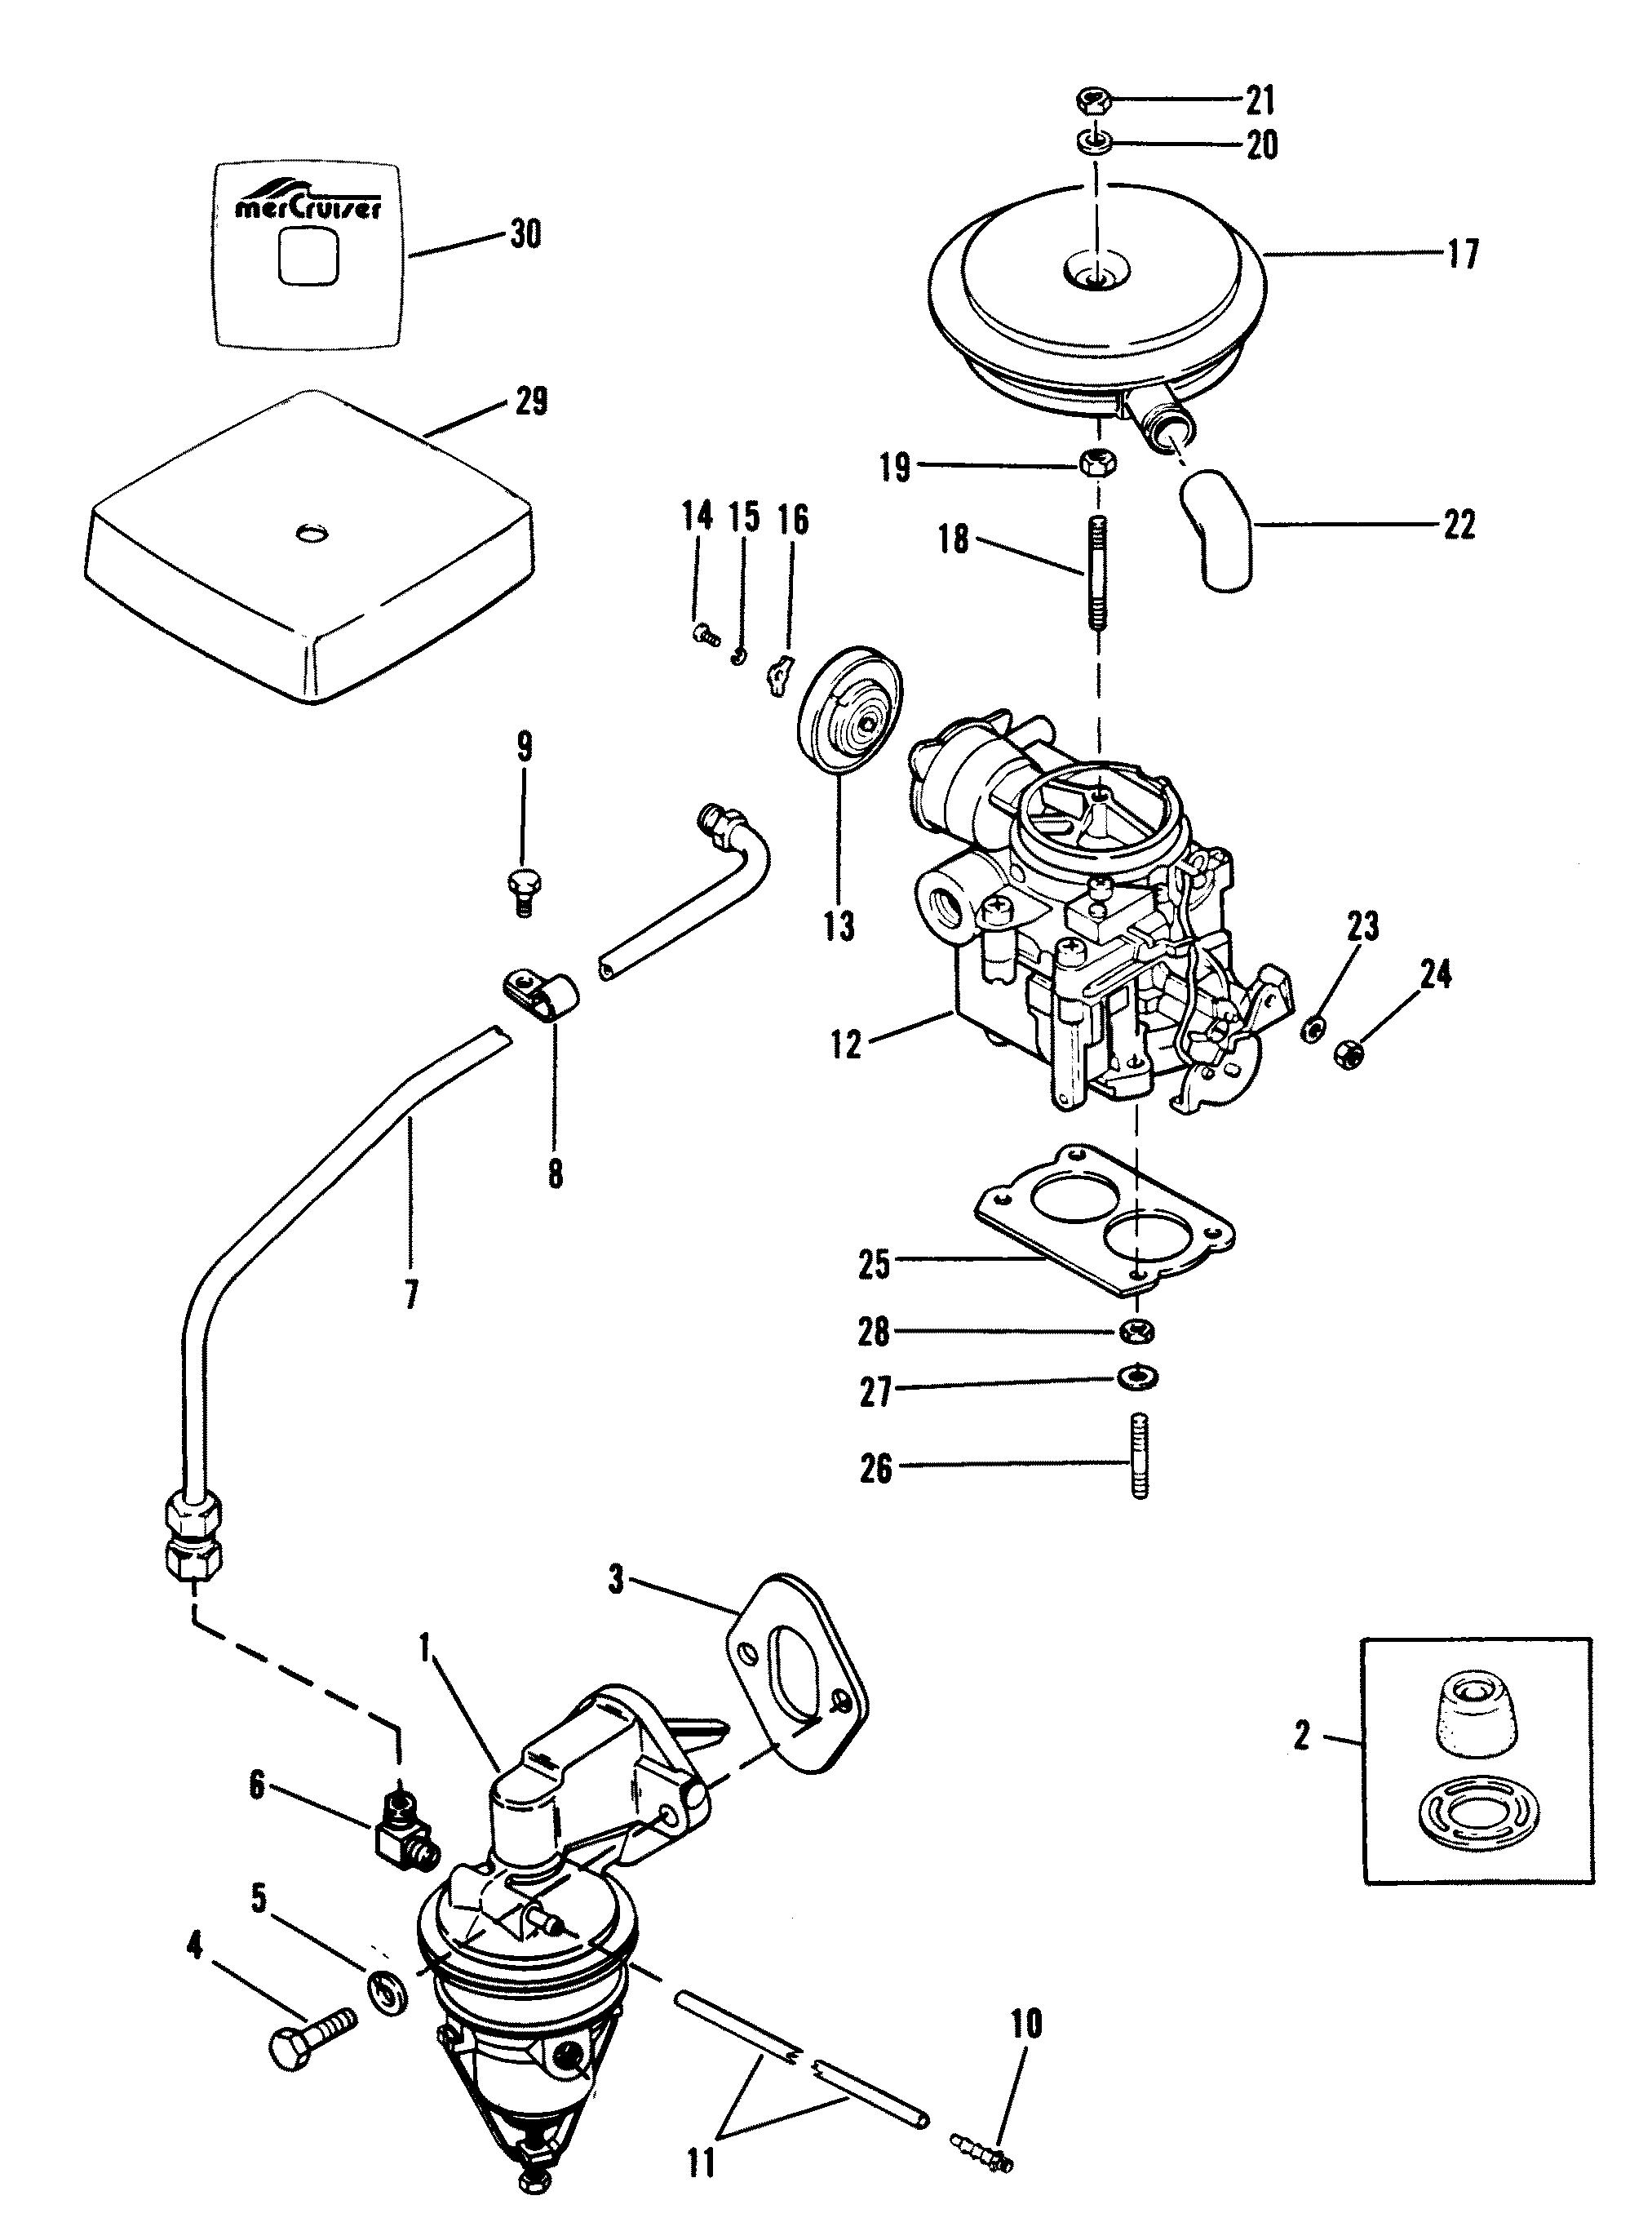 fuel pump and carburetor new design for mercruiser 120 h p